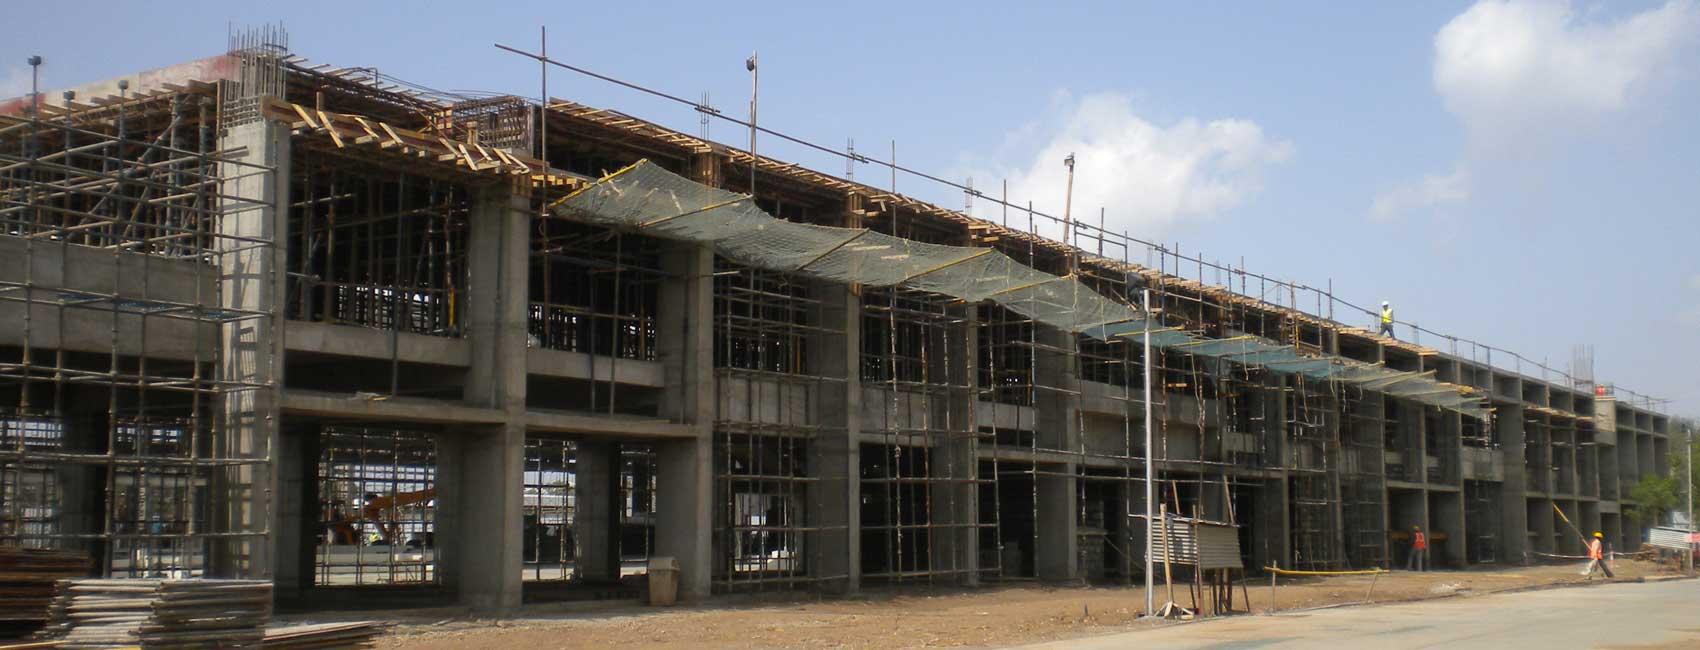 Bosch Ltd Nasik Devi Construction Company Come Live